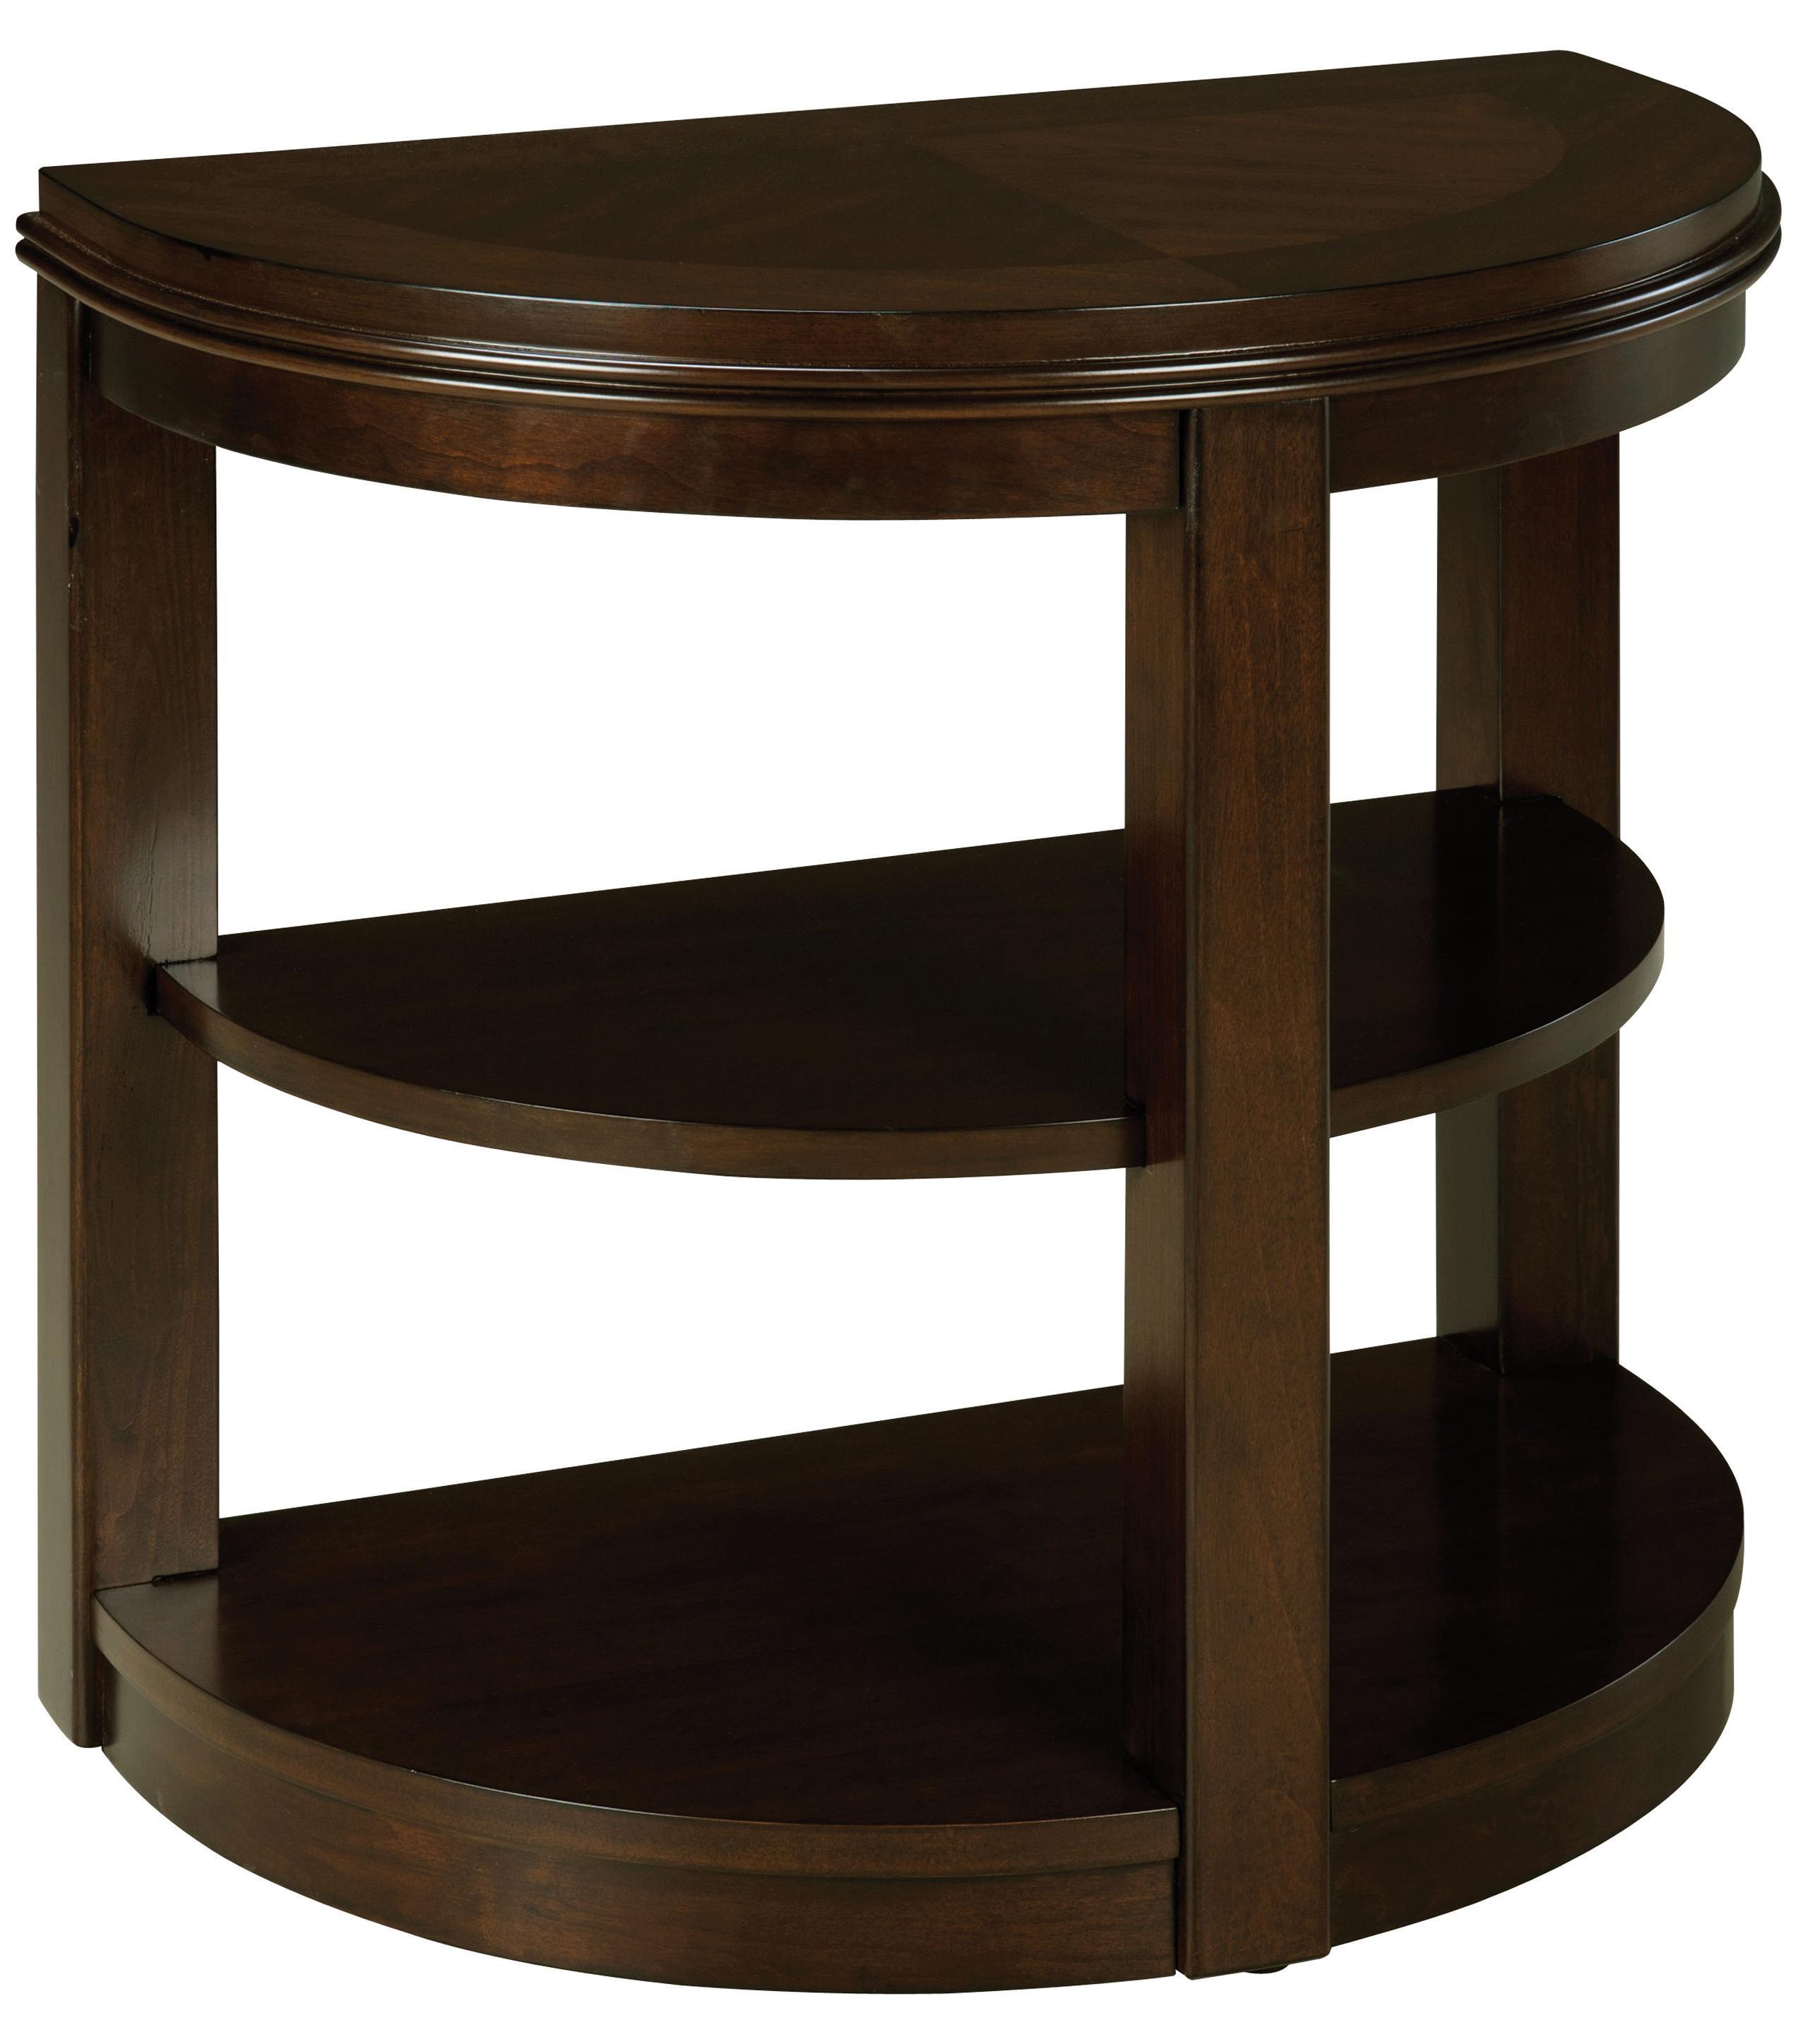 Standard Furniture Spencer Chairside Table - Item Number: 23795